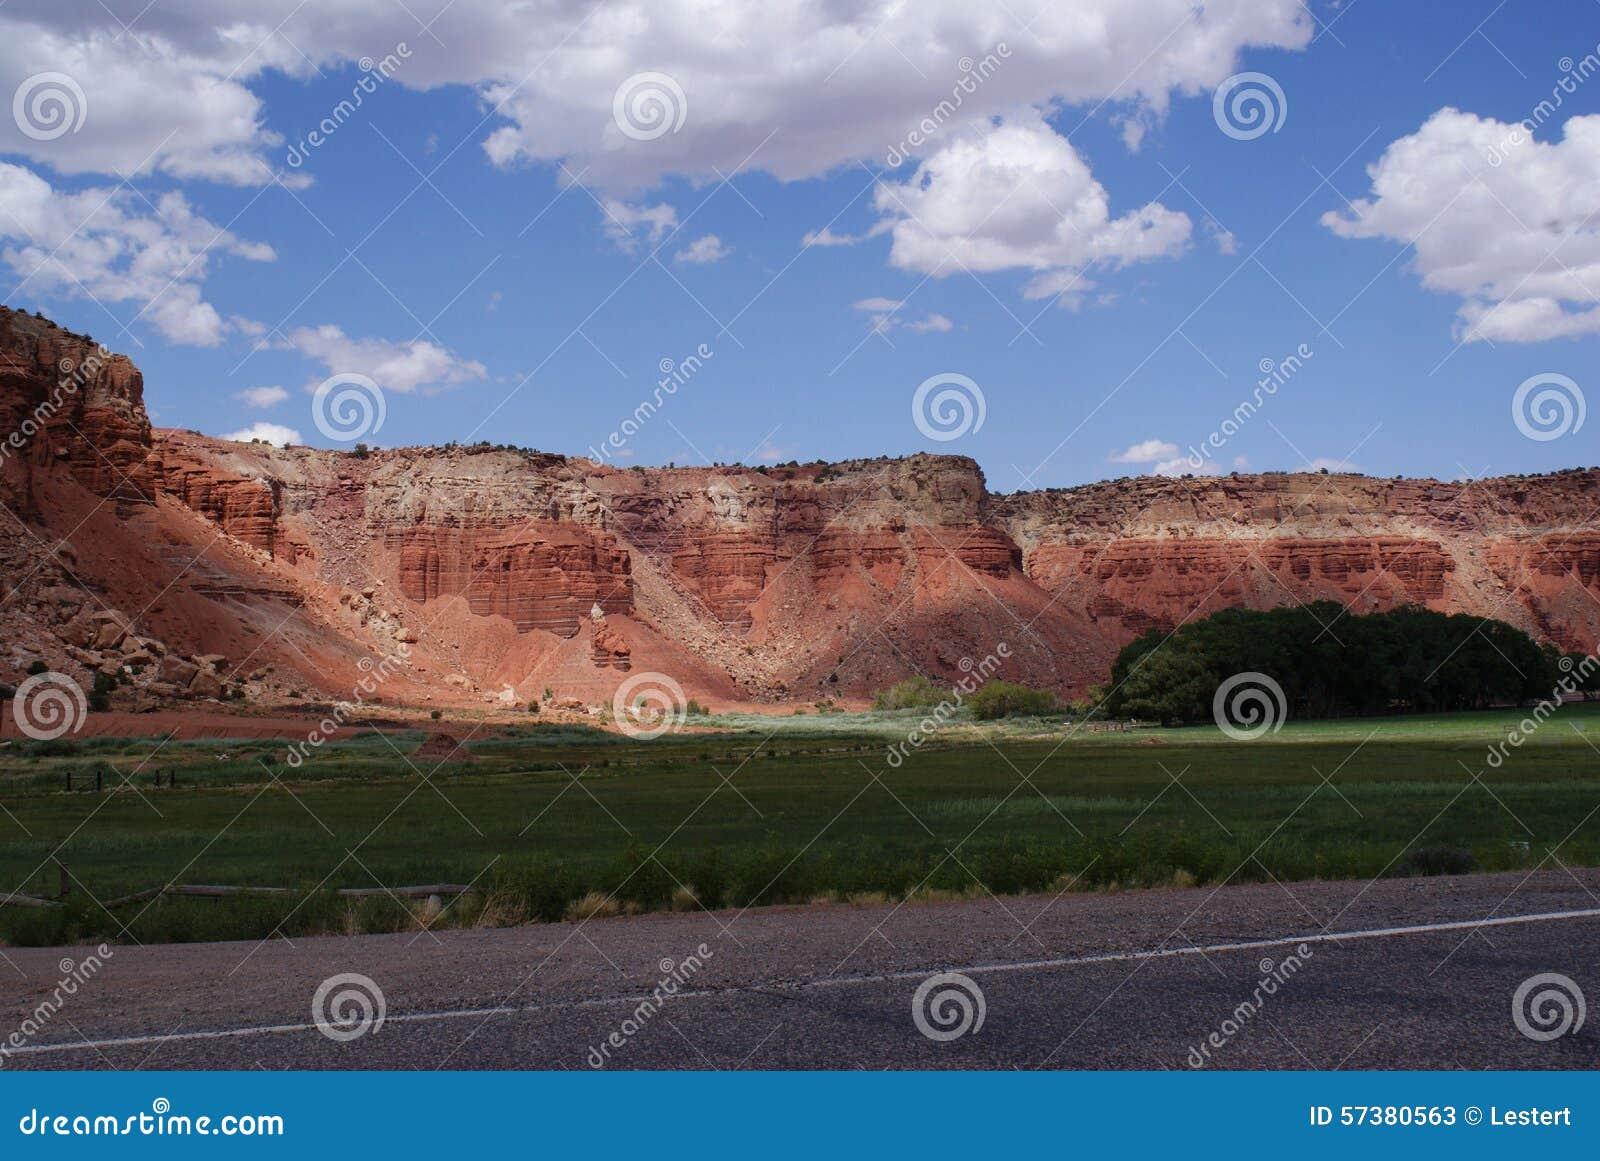 Rode Klippen en Groene Weilanden